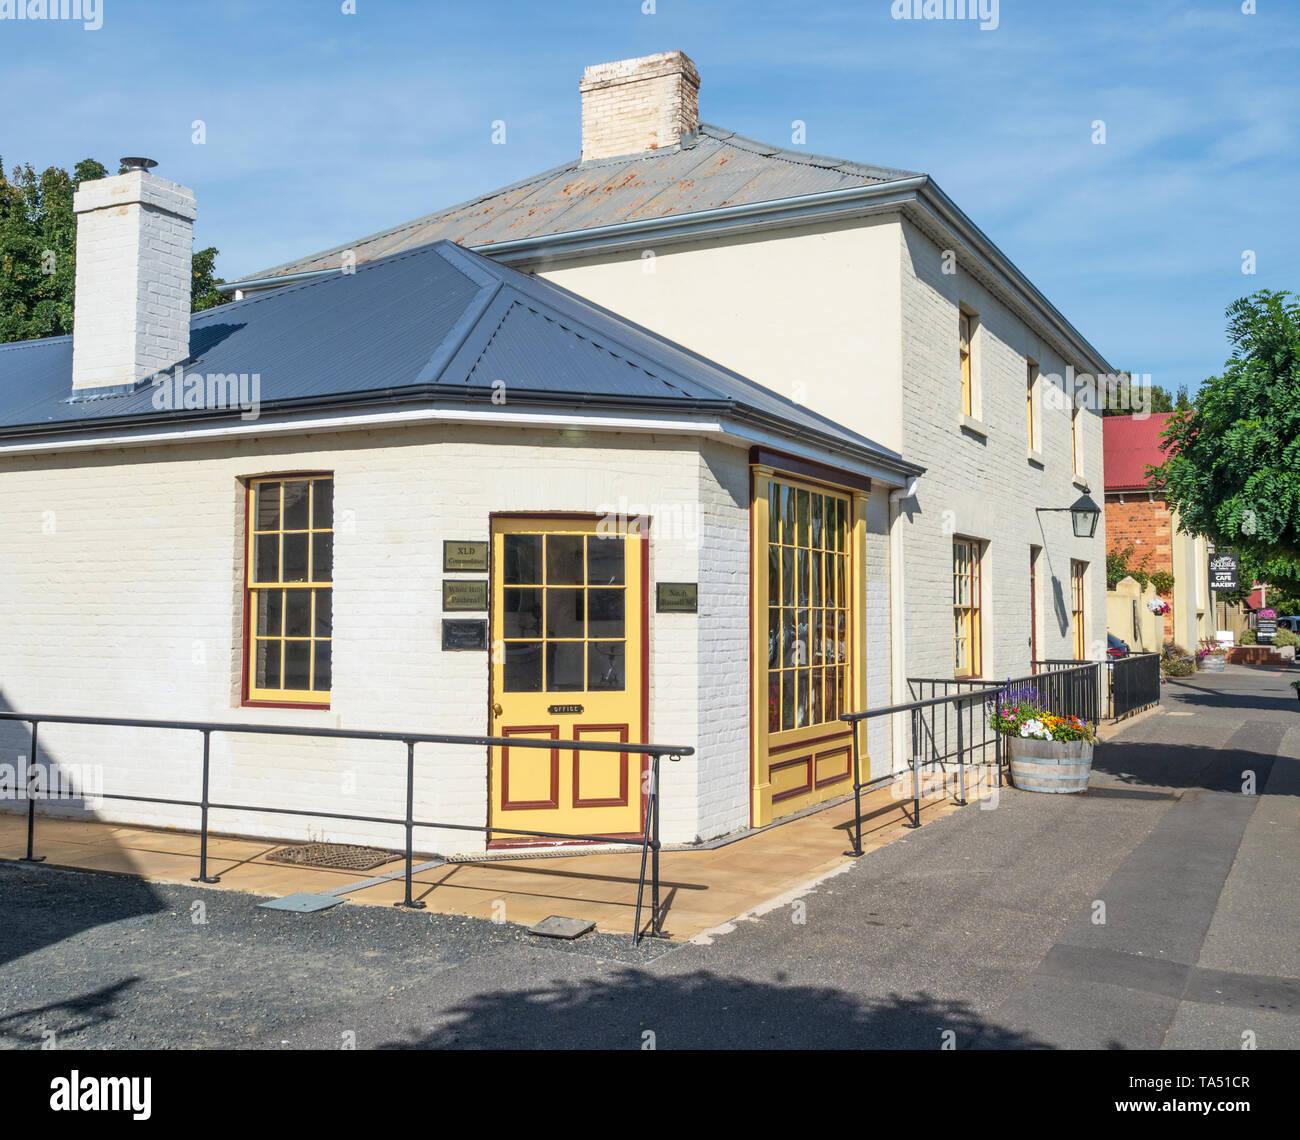 TASMANIA, AUSTRALIA - MARCH 4, 2019: Old buildings in Russell Street, in the historic town of Evandale in Tasmania, Australia Stock Photo